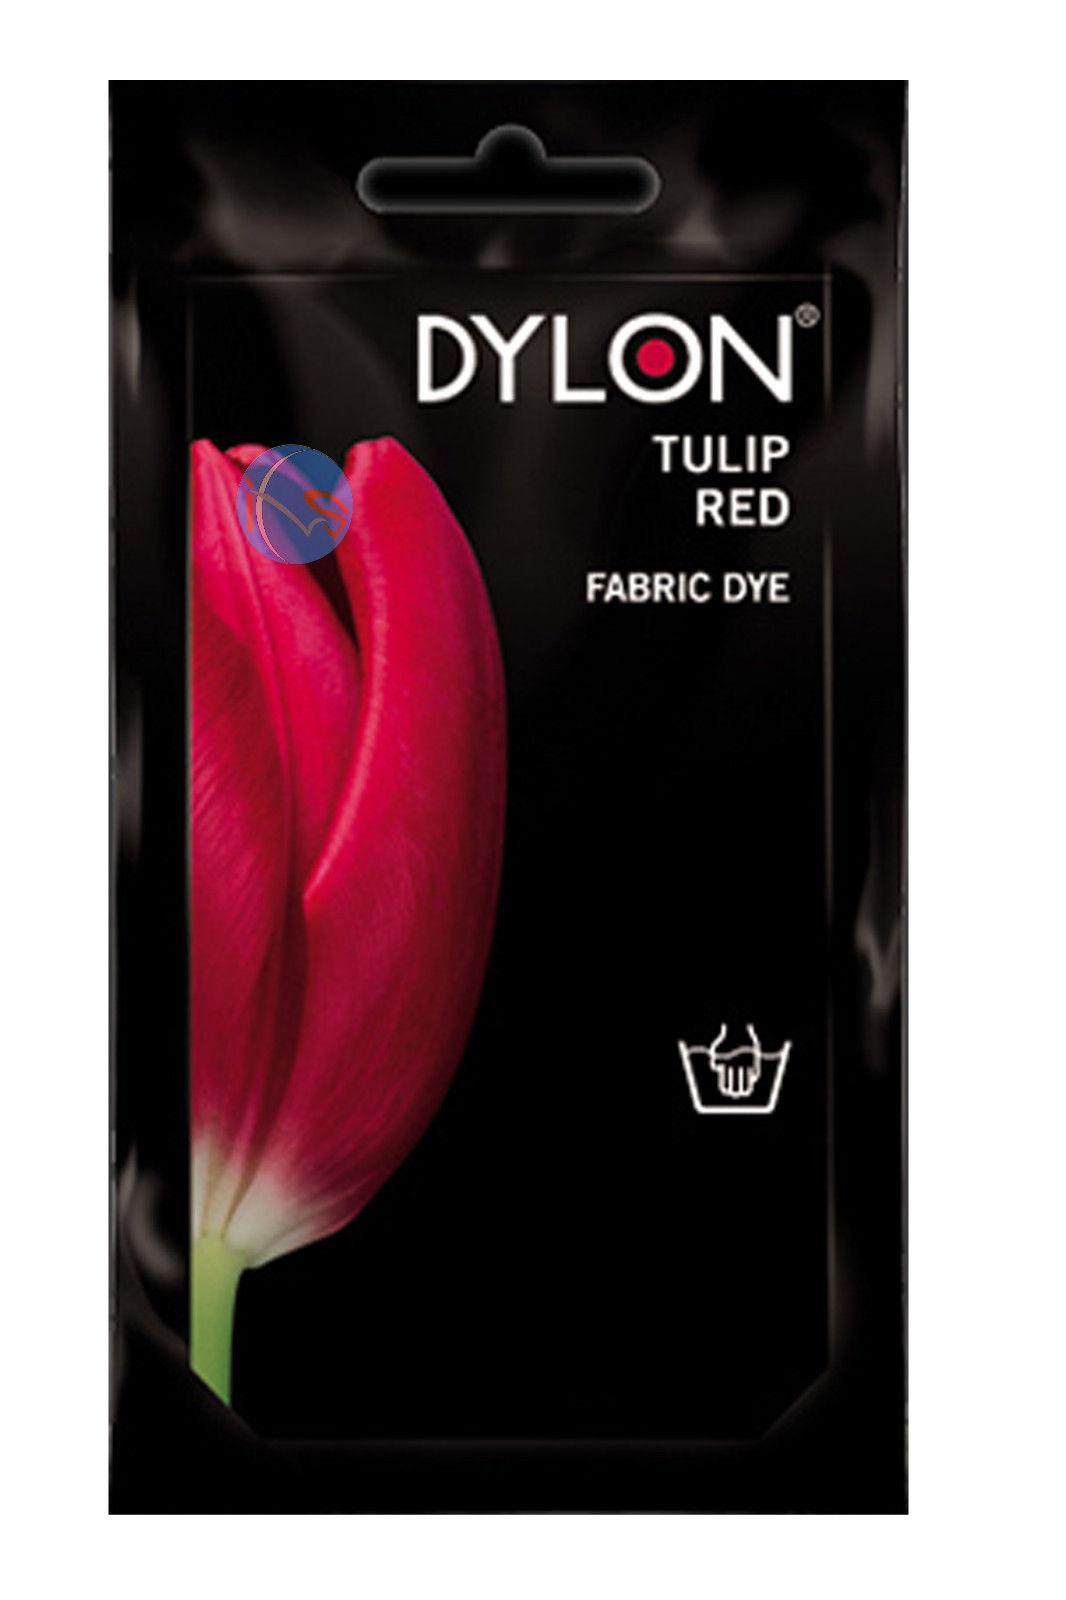 dylon hand dye 50g 24 colours available ebay. Black Bedroom Furniture Sets. Home Design Ideas